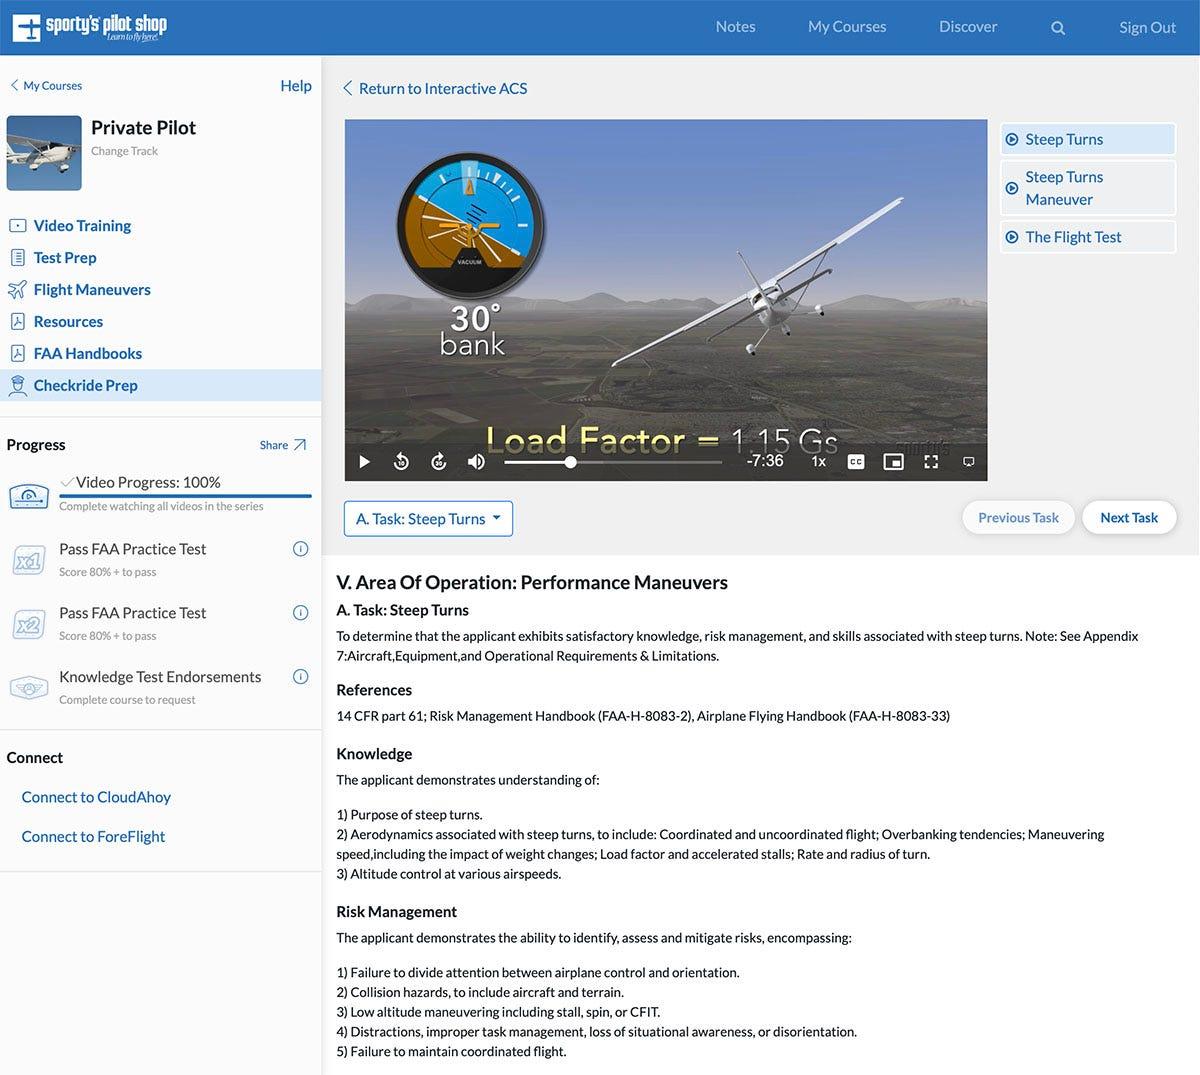 Airman Certification Standards